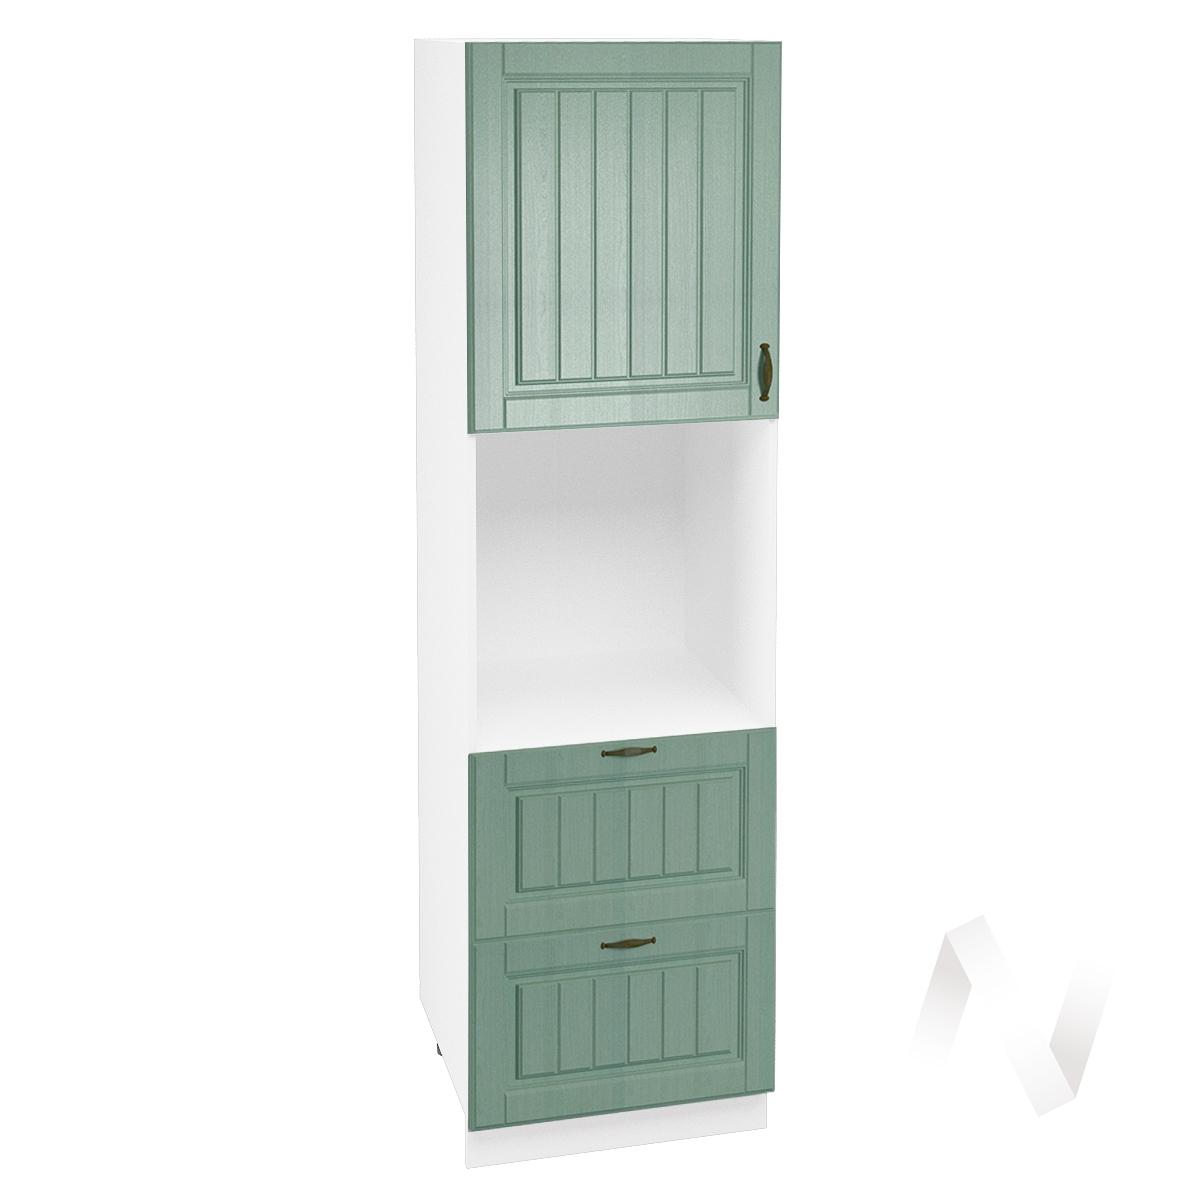 "Кухня ""Прованс"": Шкаф пенал с 2-мя ящиками 600, ШП2Я 600 (корпус белый)"